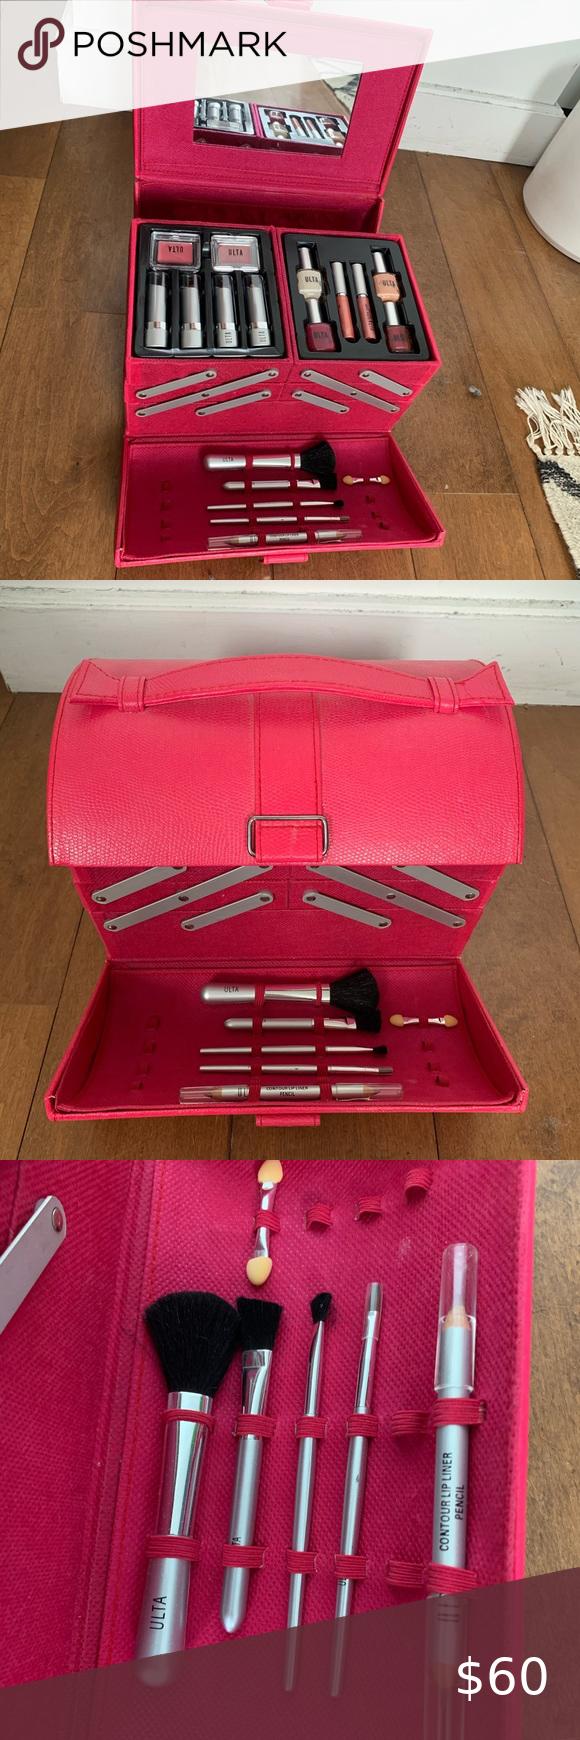 Ulta Beauty Makeup Box in 2020 Ulta beauty makeup